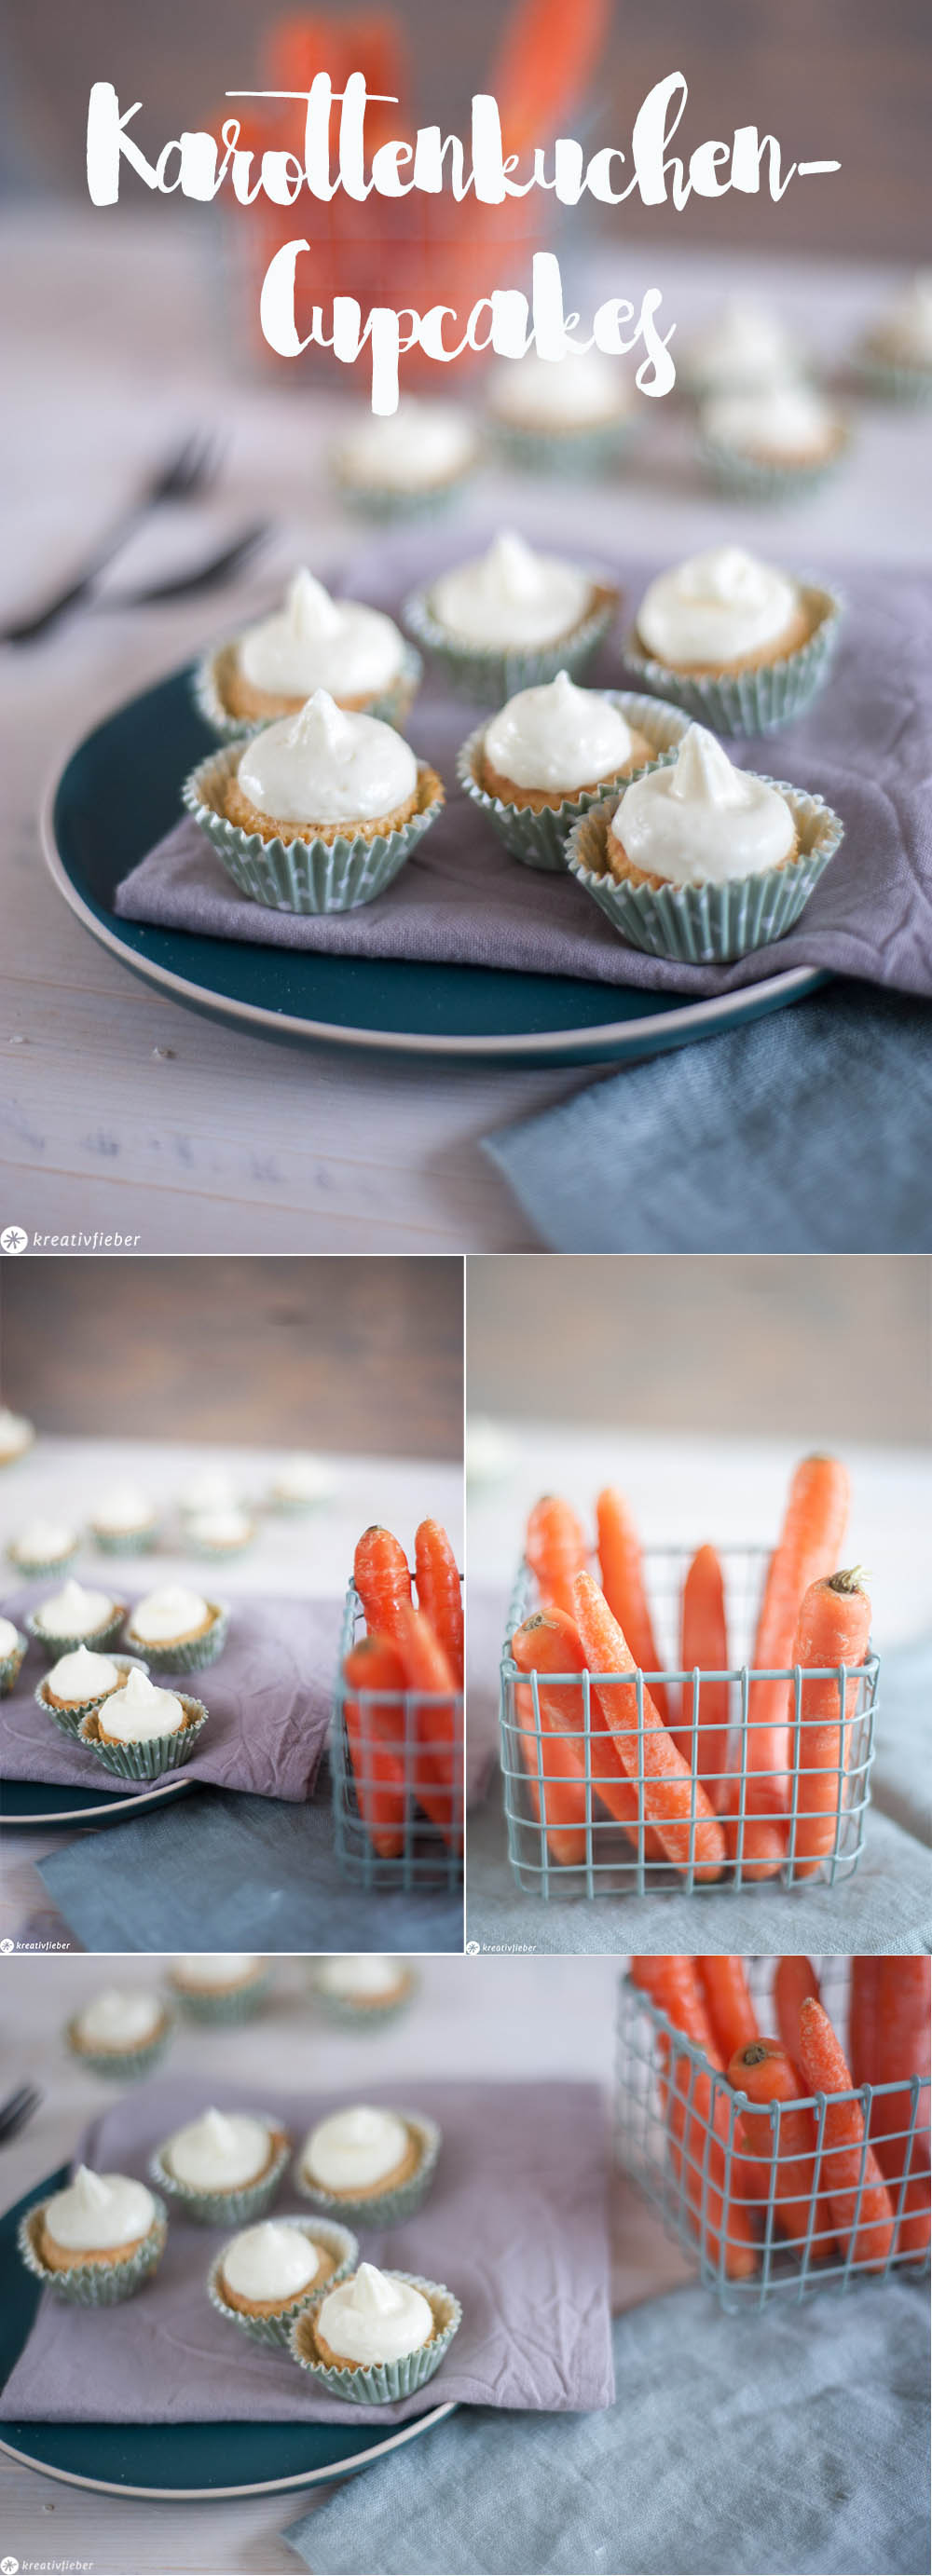 Karottenkuchen Cupcakes Rüblicupcakes Mini Möhrencupcakes